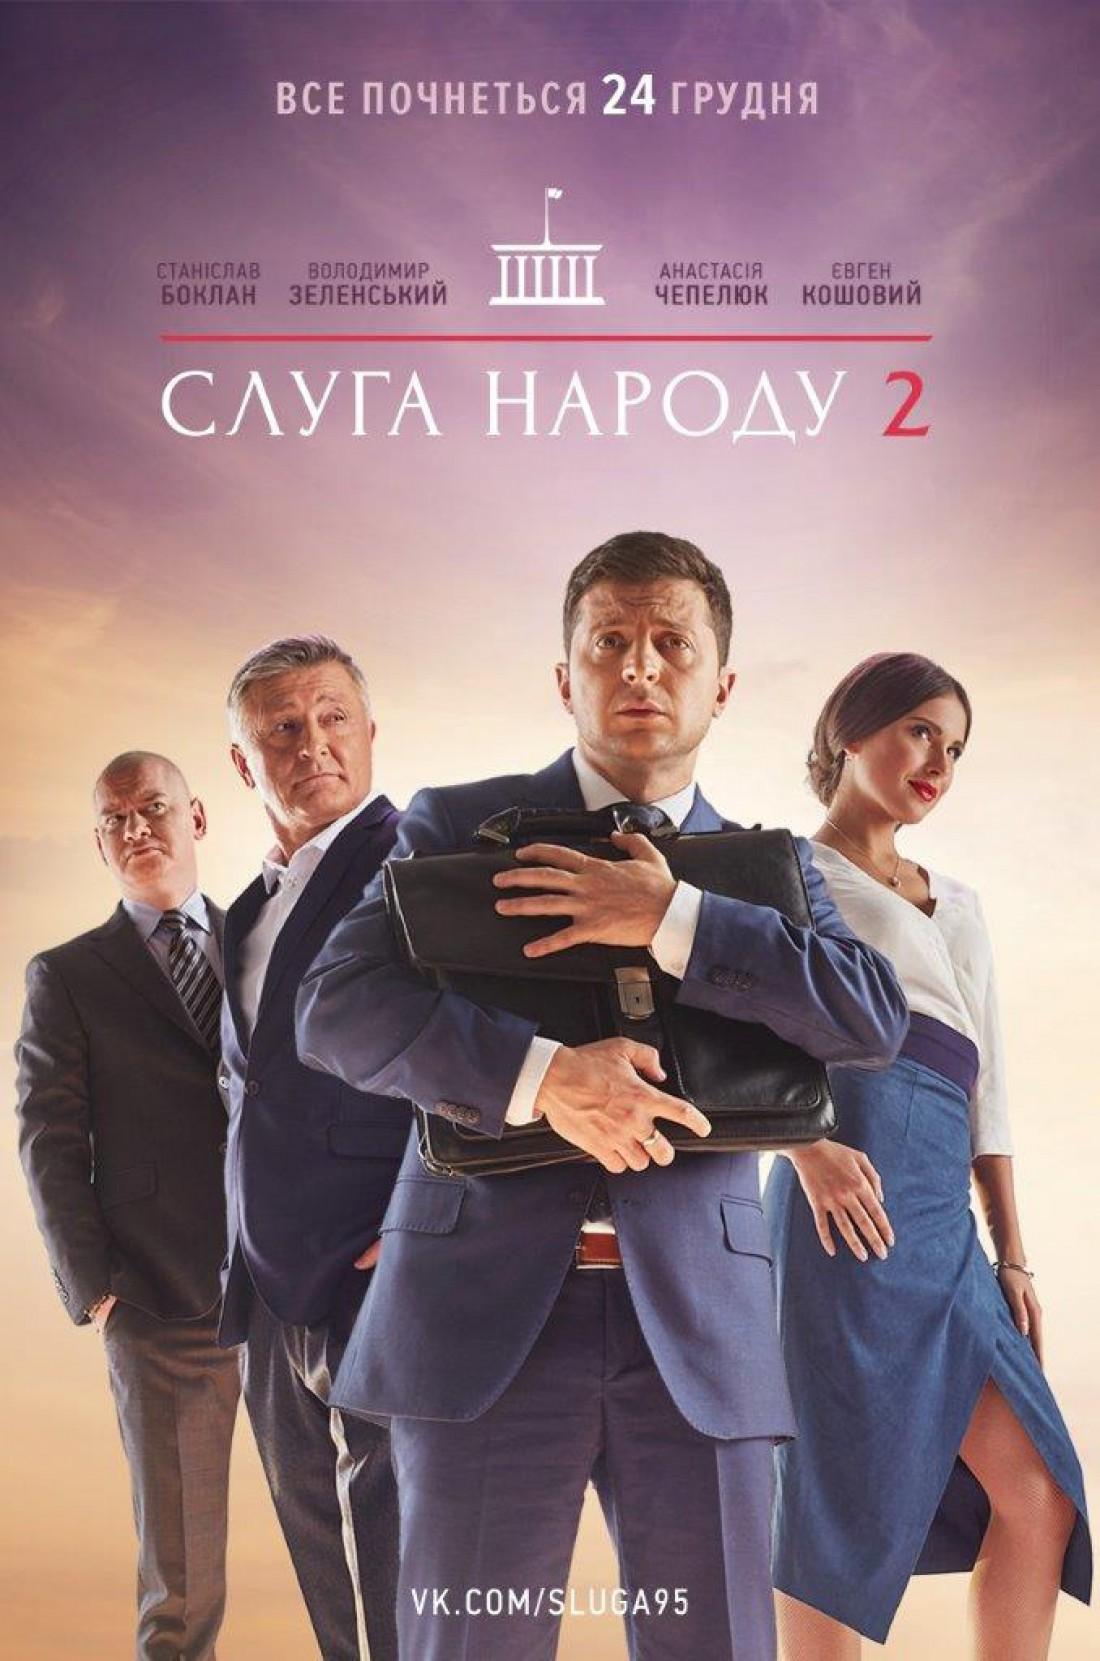 Постер фильму Слуга народу 2